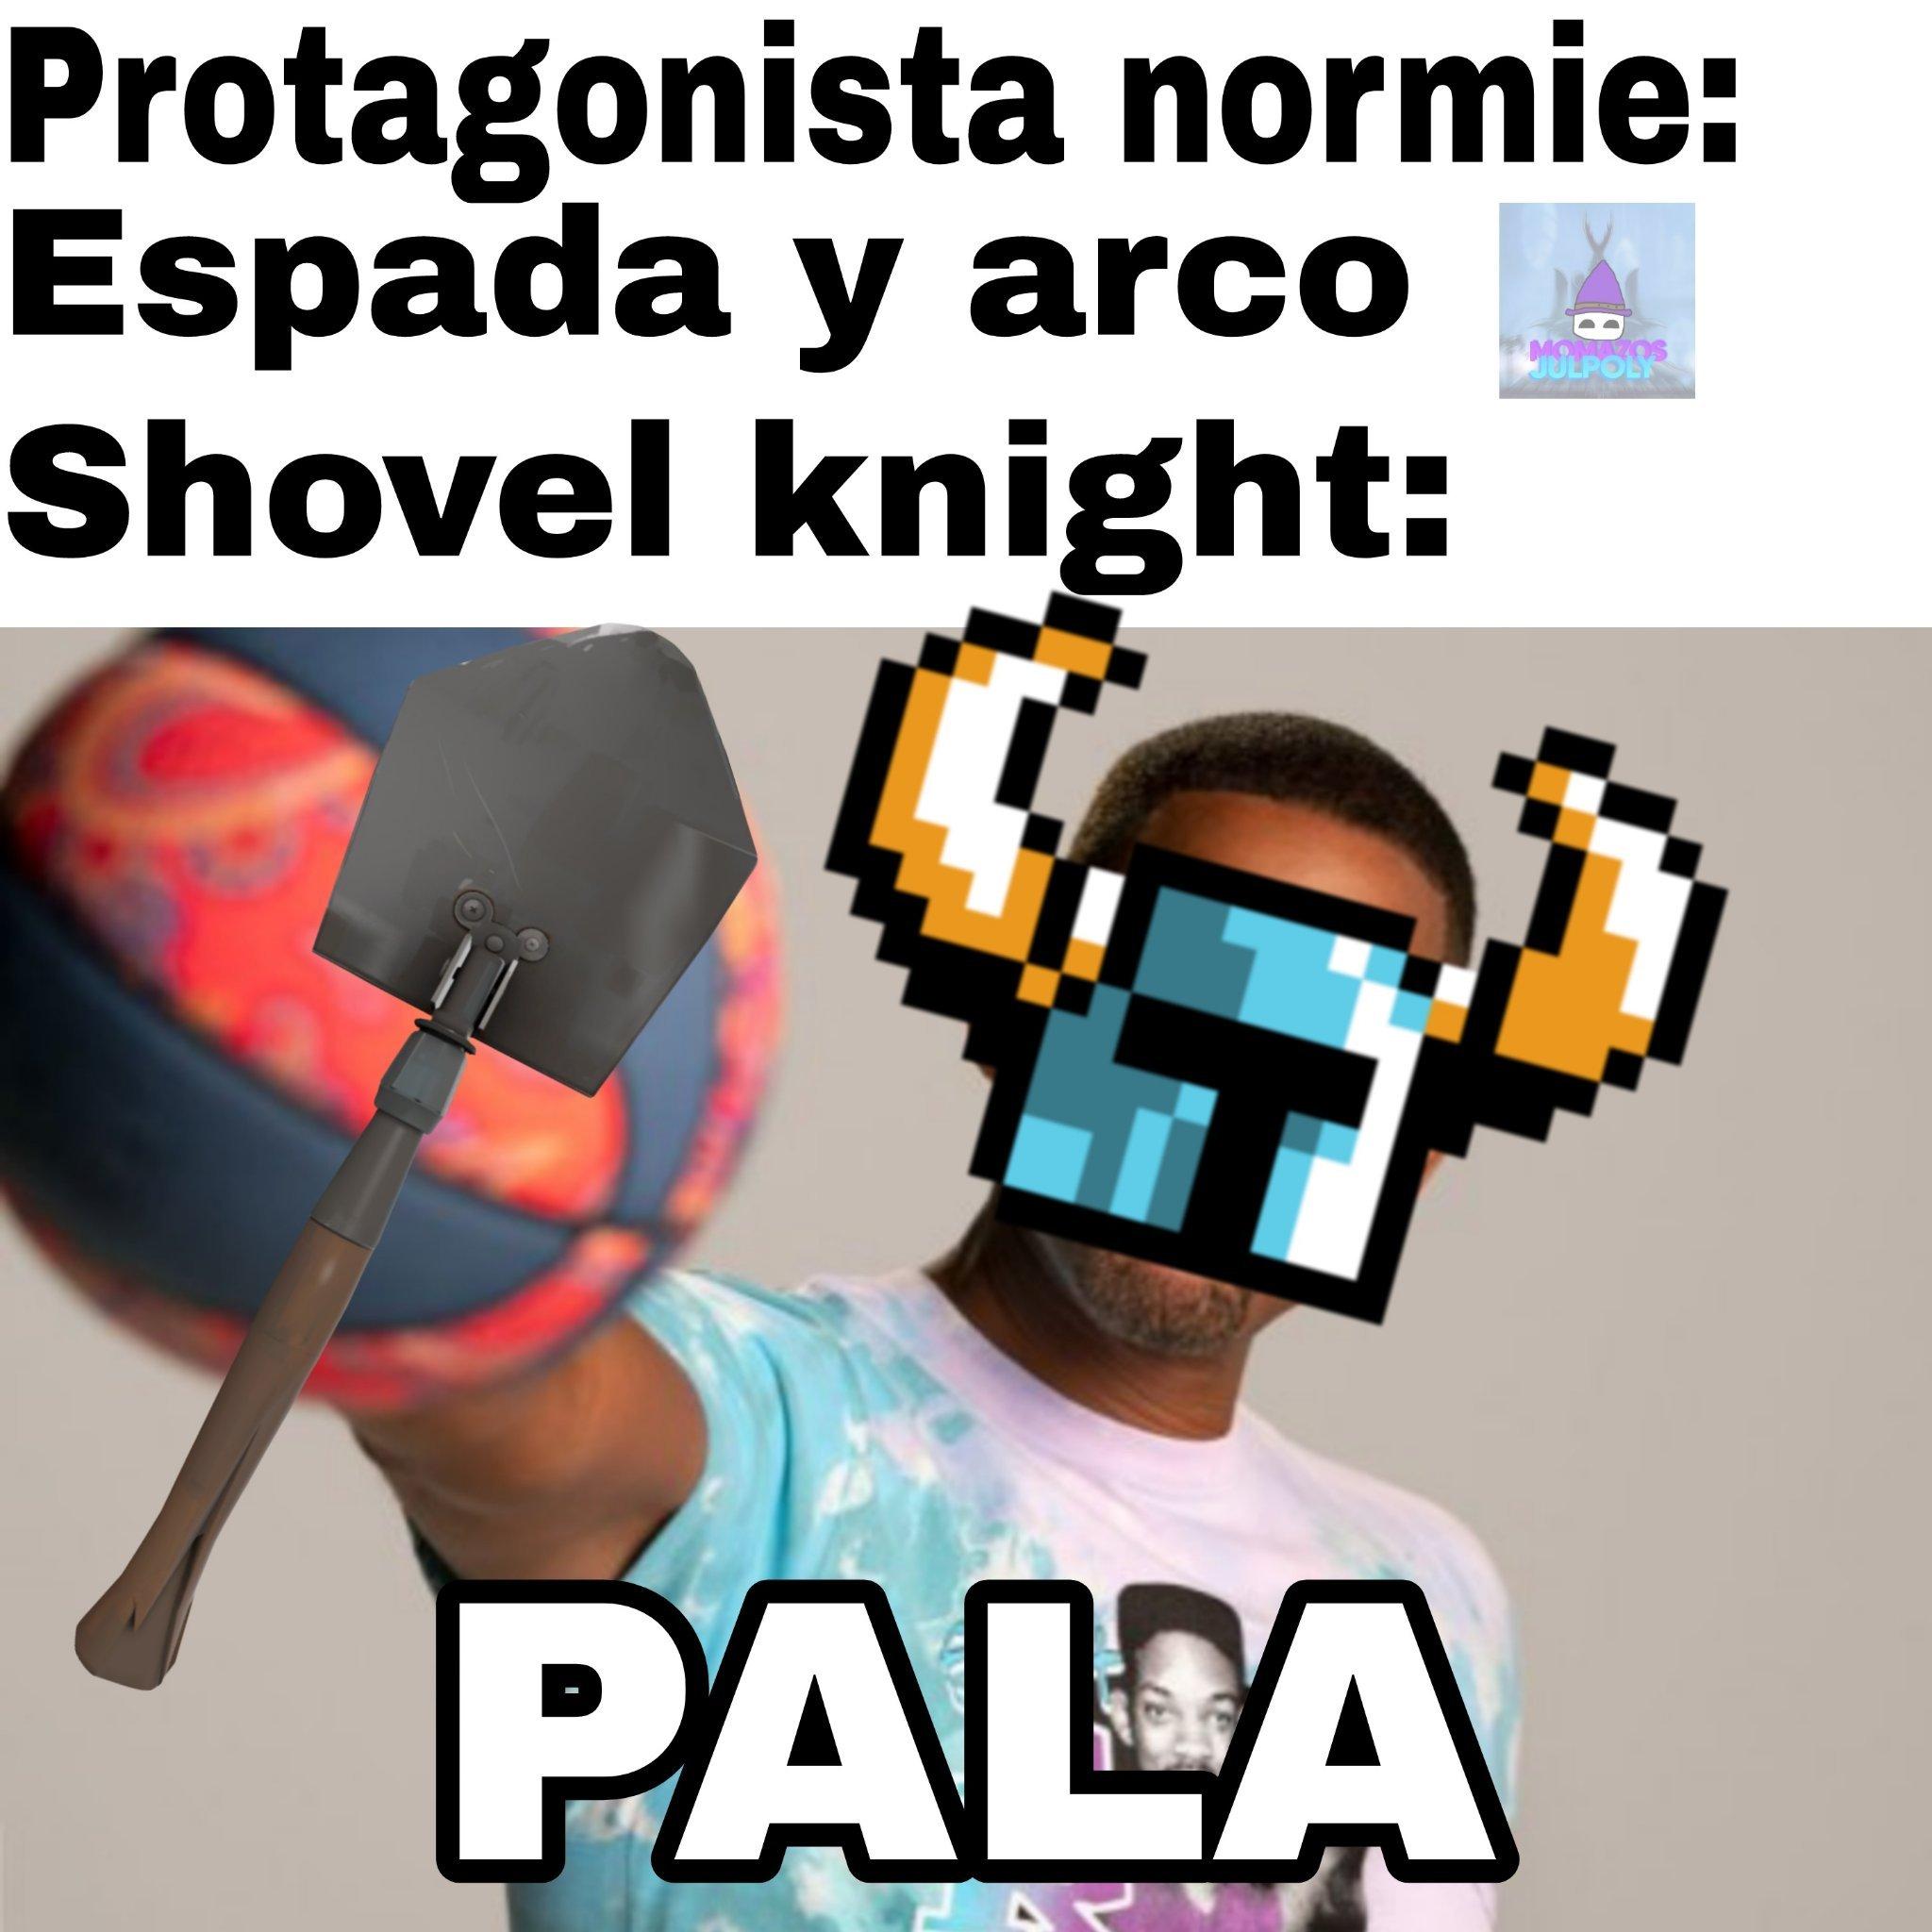 Chad shovel knight - meme